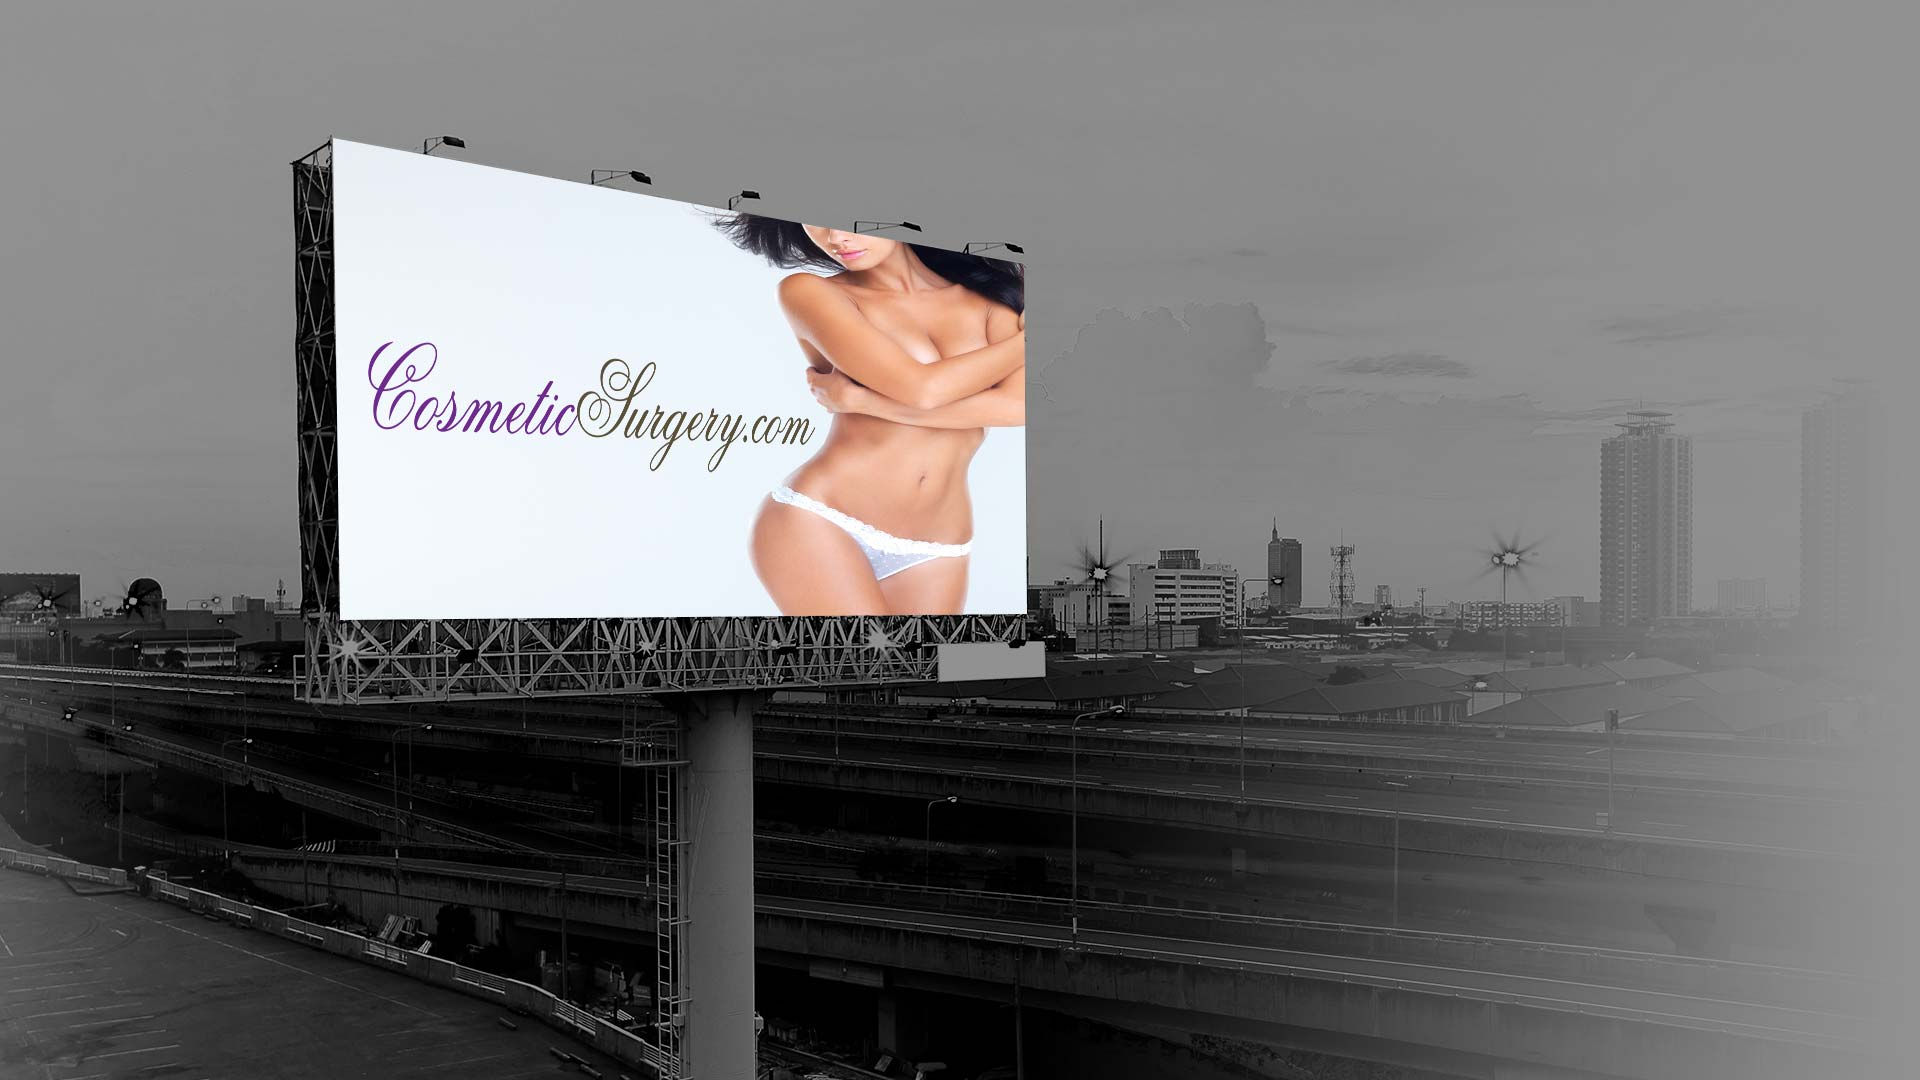 Billboard promotion